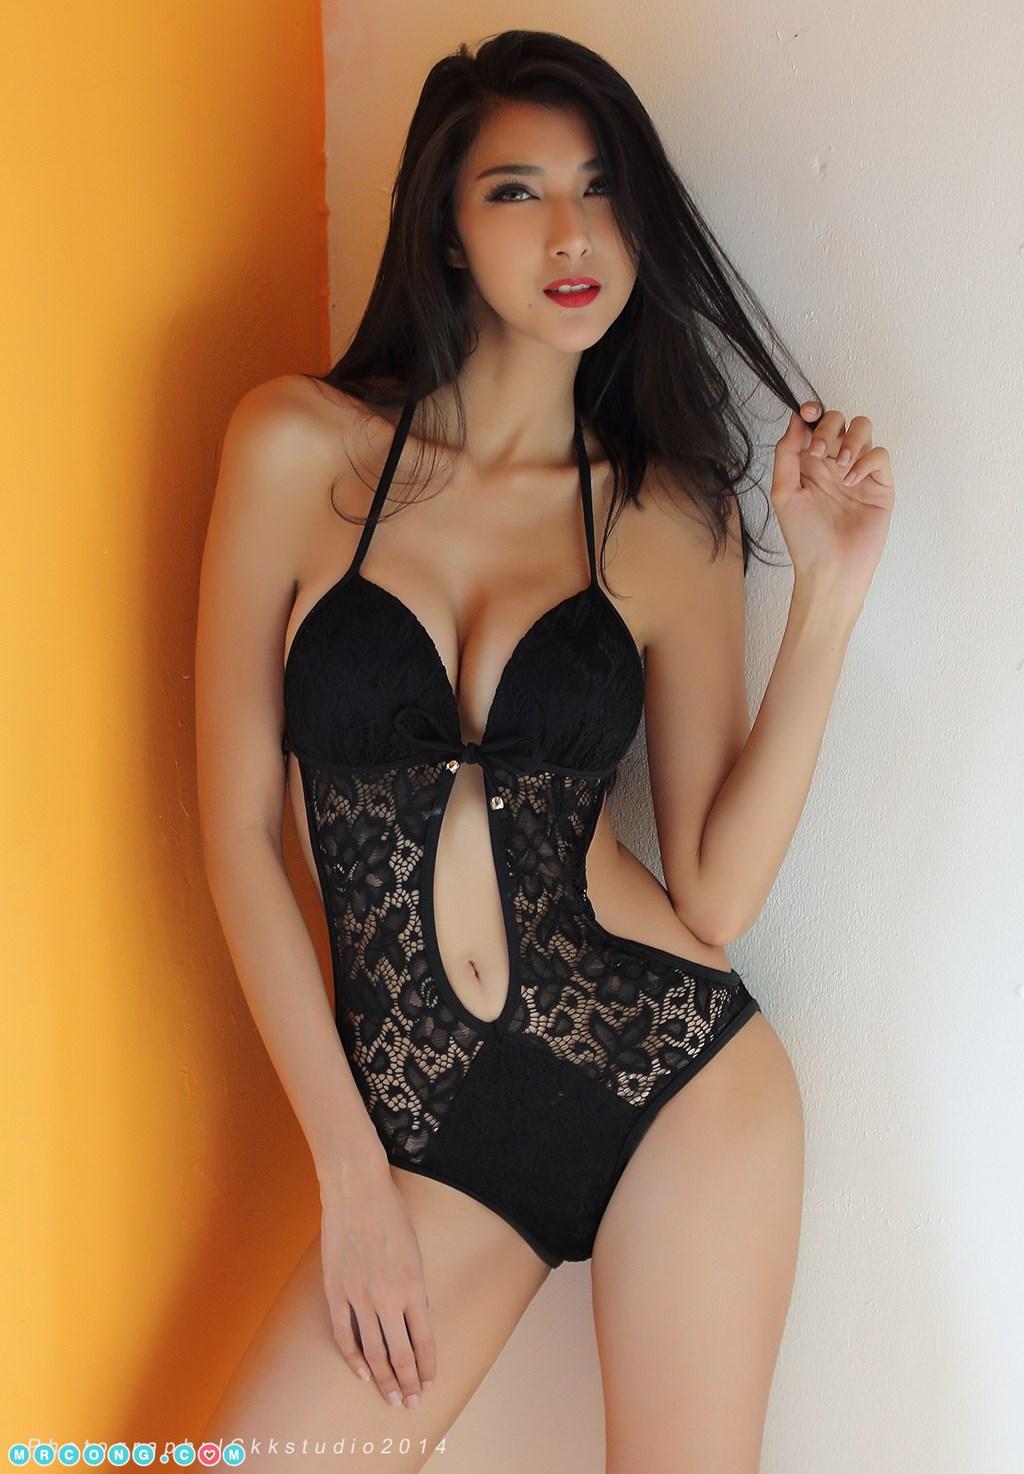 Image Thai-Model-No.345-Takky-Chonticha-Sujitalom-MrCong.com-003 in post Thai Model No.345: Người mẫu Takky Chonticha Sujitalom (27 ảnh)